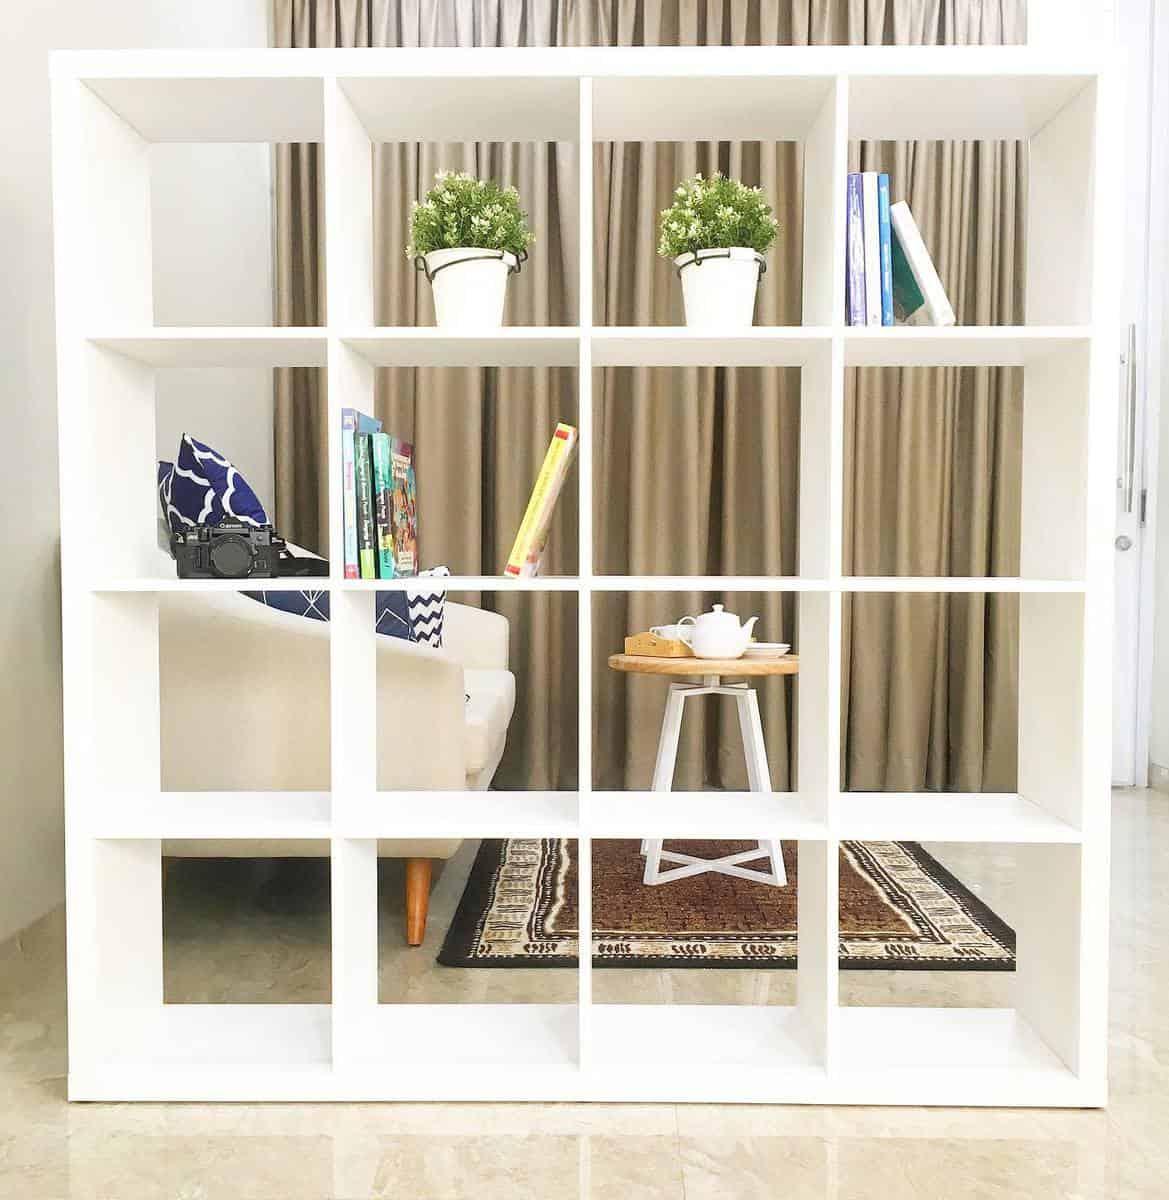 Bookcase Temporary Wall Ideas -littlemoyahome